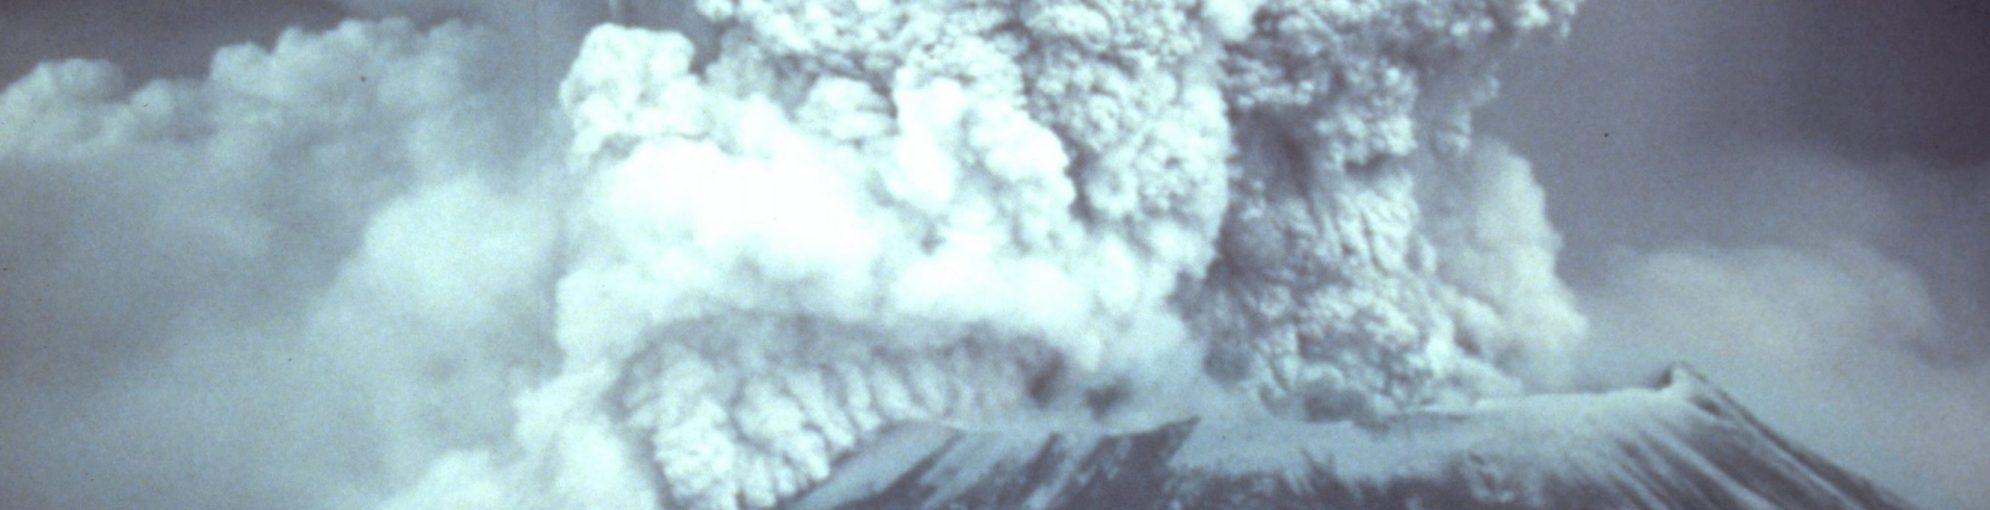 2020 IAVCEI Award for Volcano Surveillance and Crisis Management – Ceremony